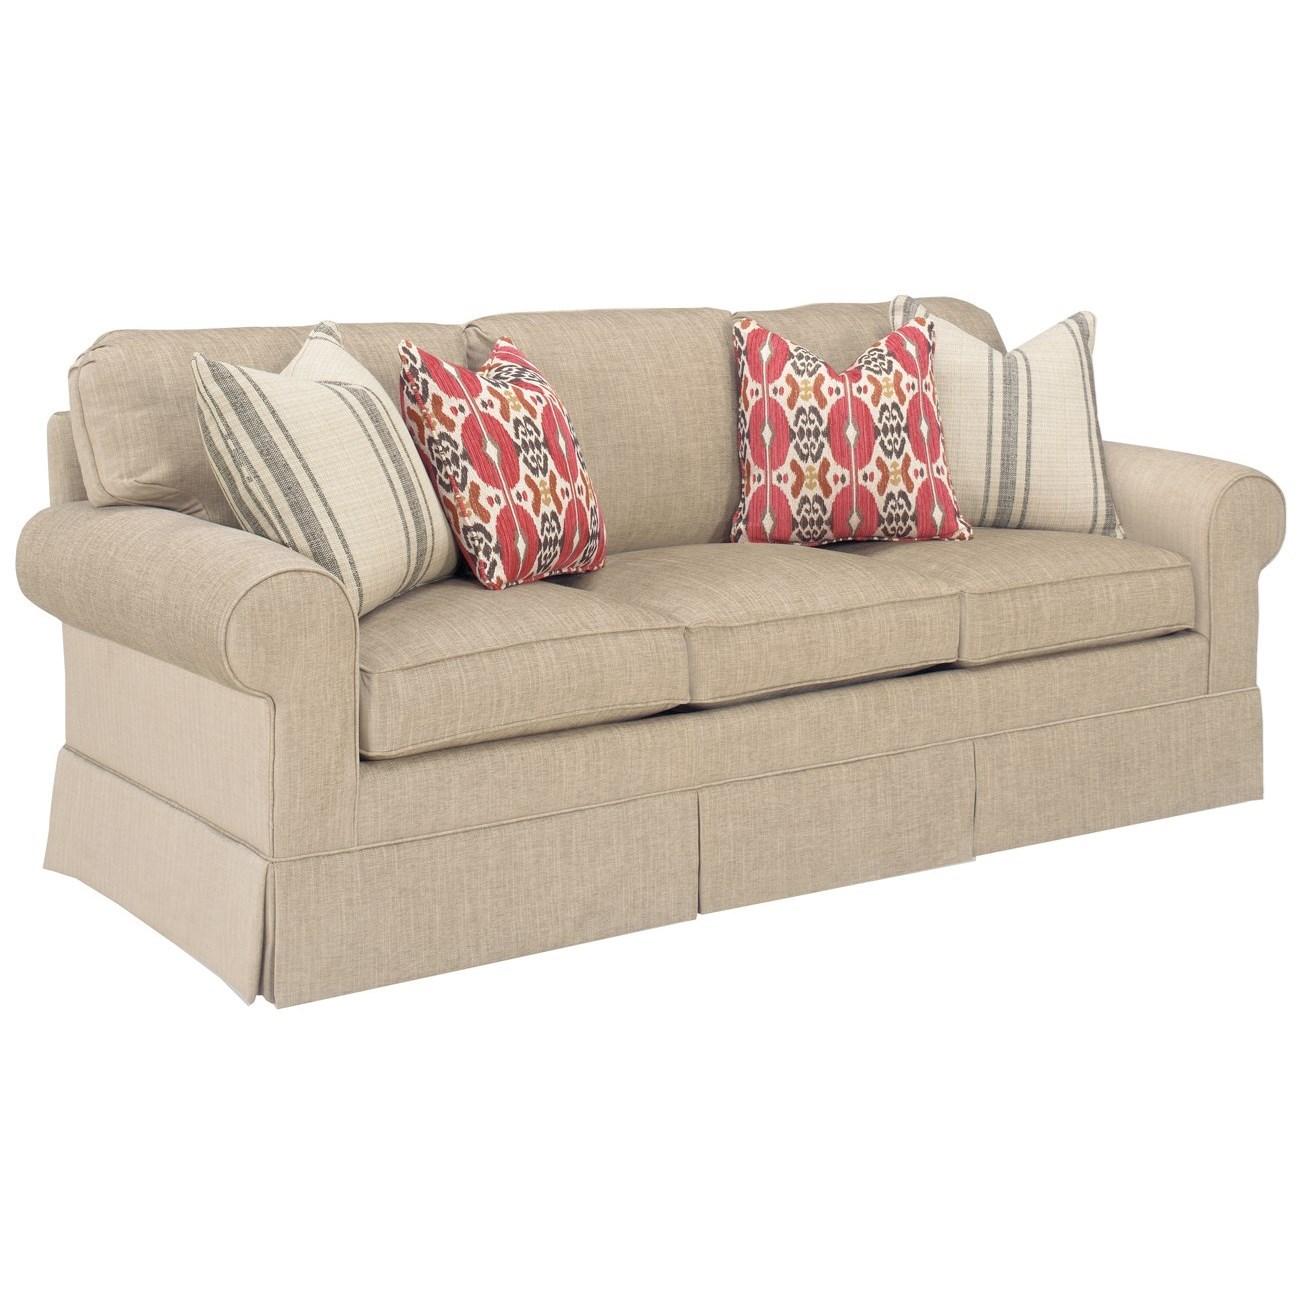 lexington sectional sofa camelback sofas personal design series bedford customizable